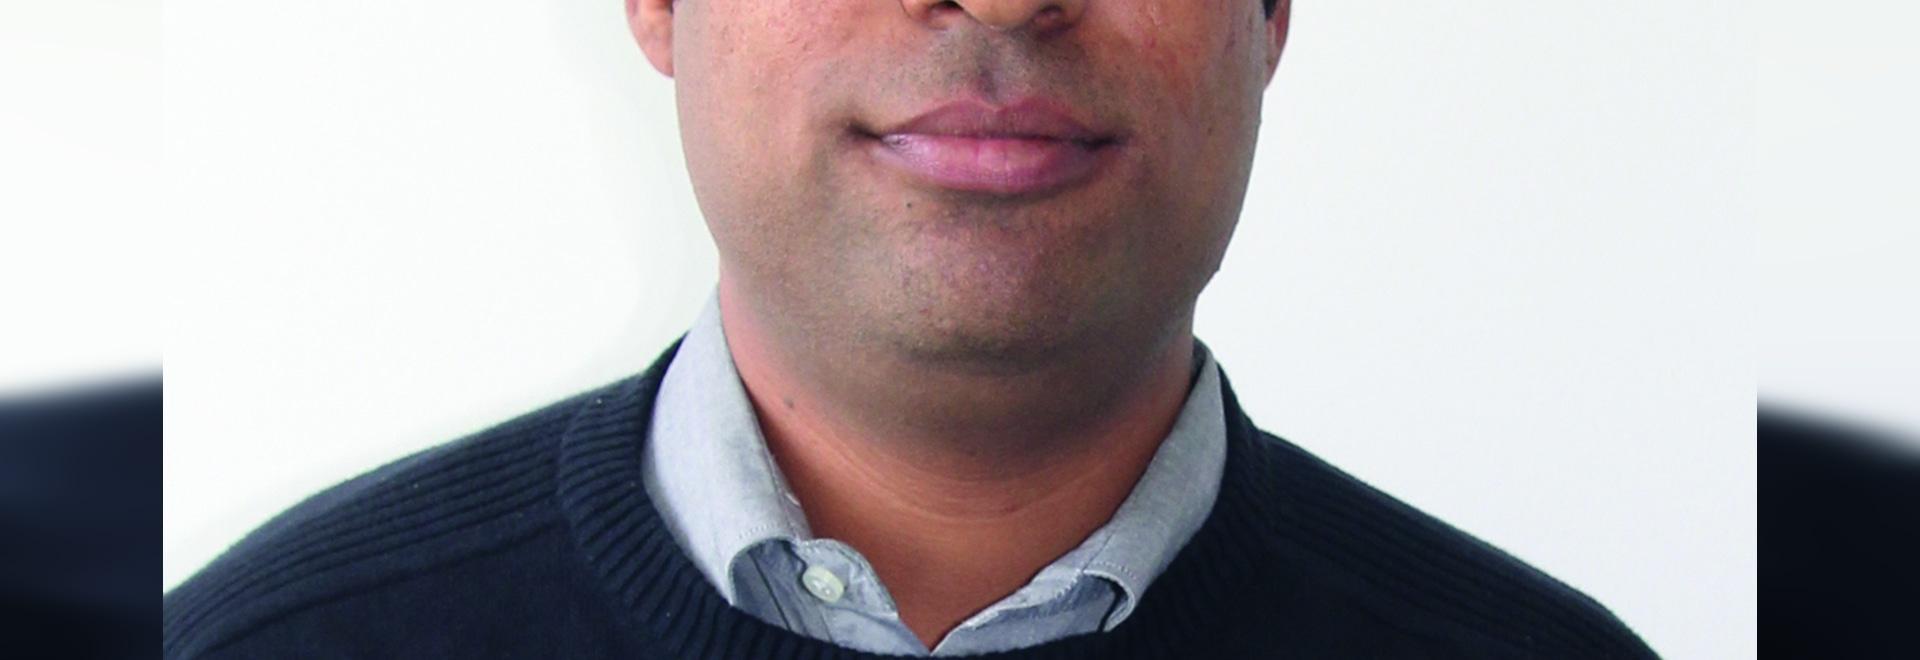 Vivek Ghewari